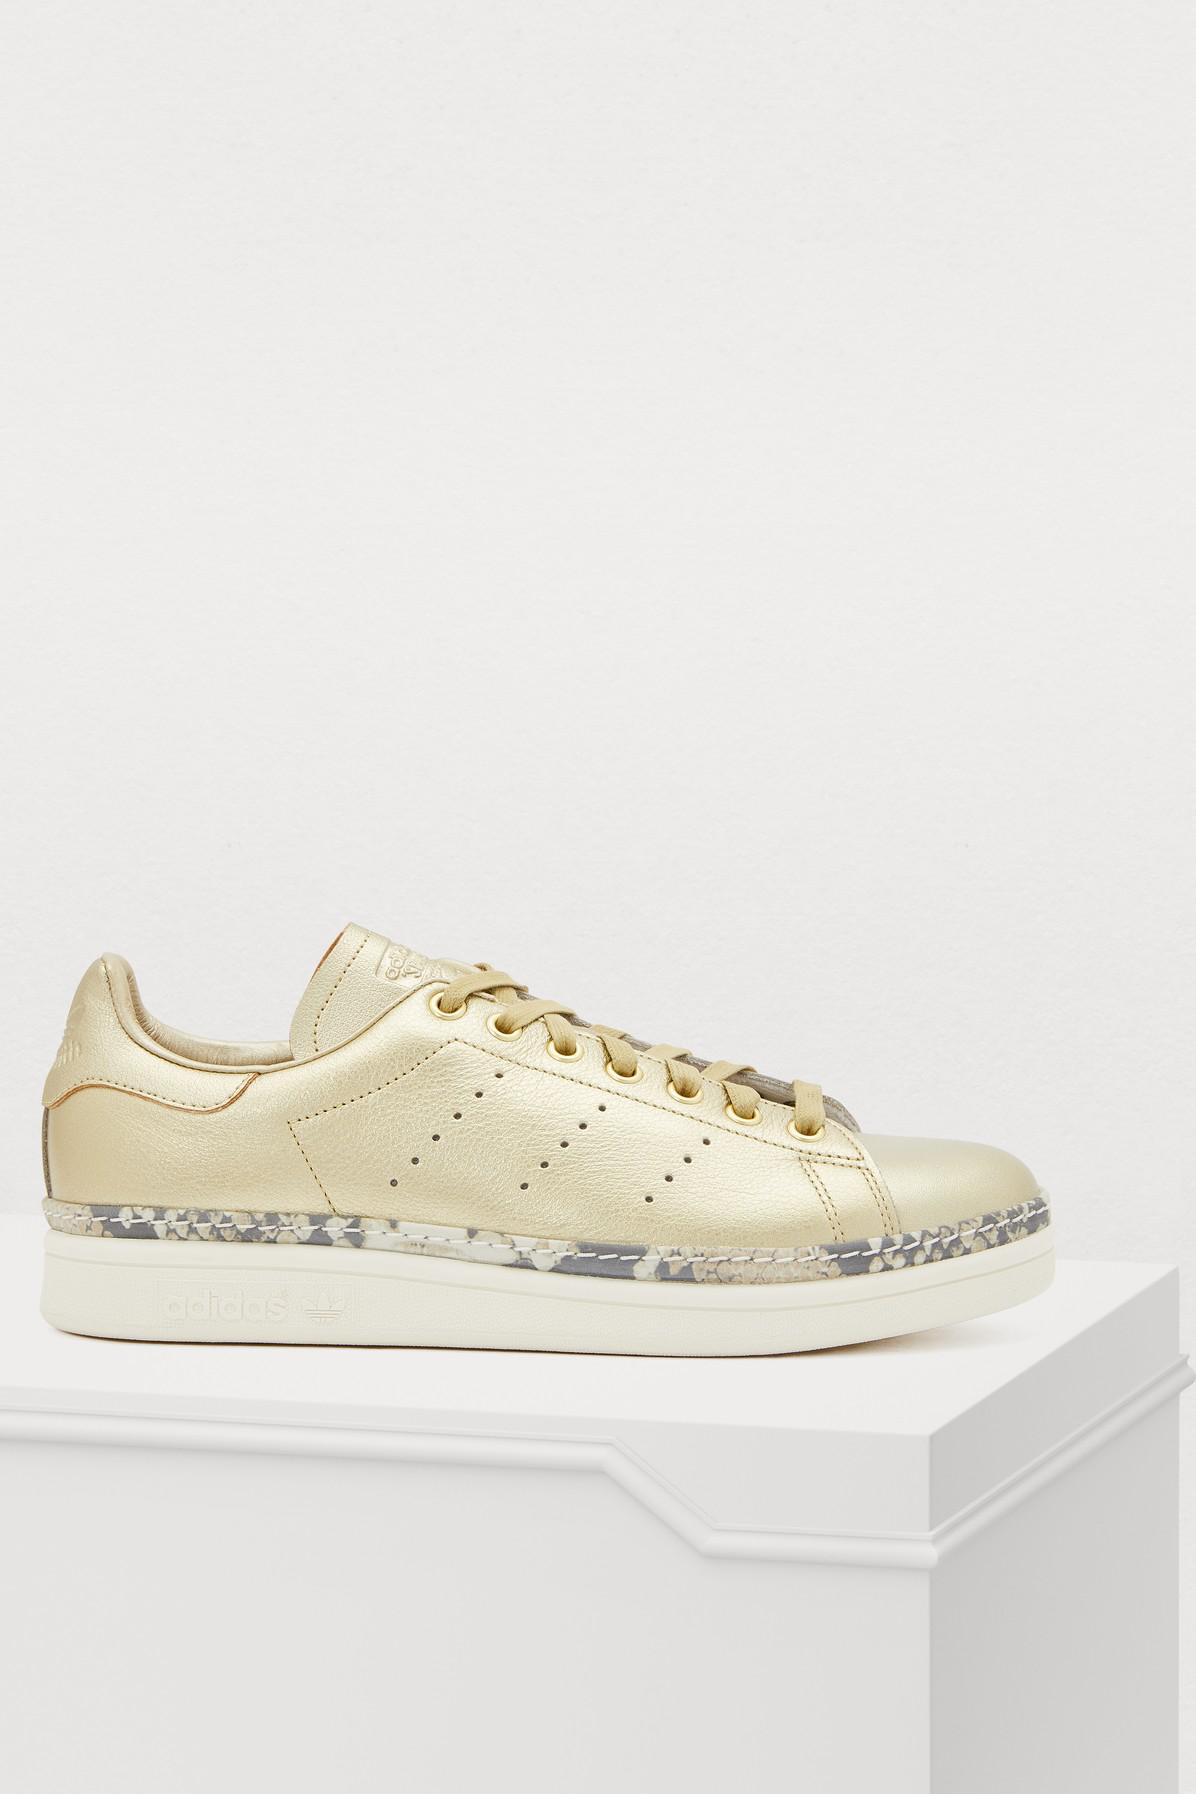 Adidas Originals Stan Smith New Bold Sneakers In Ormeta/Ormeta/Blacas